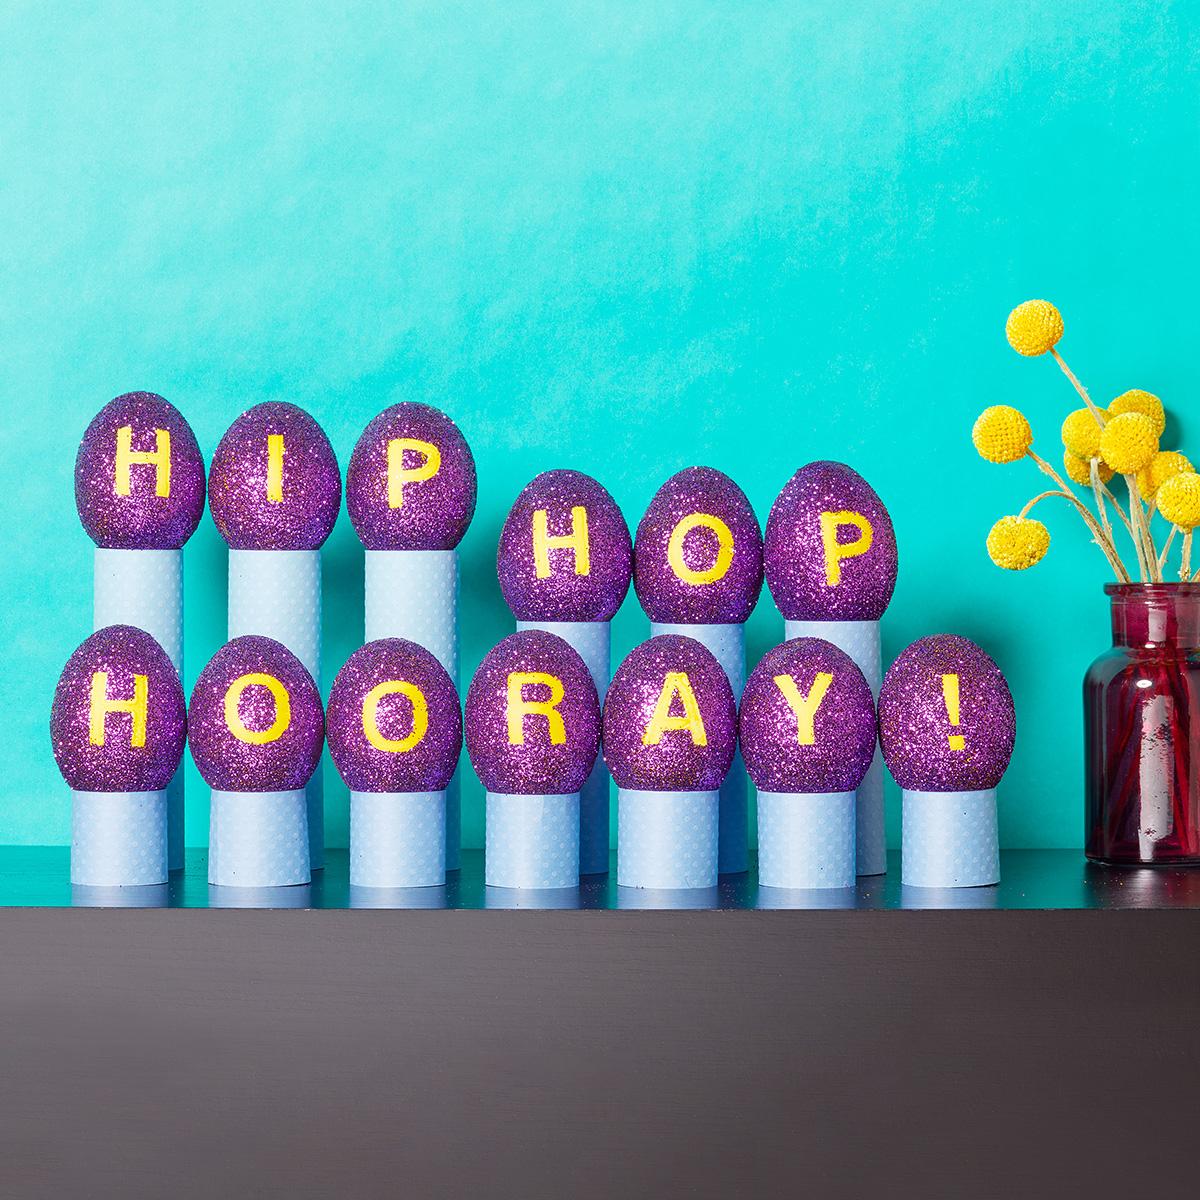 purple glitter easter eggs hip hop hooray